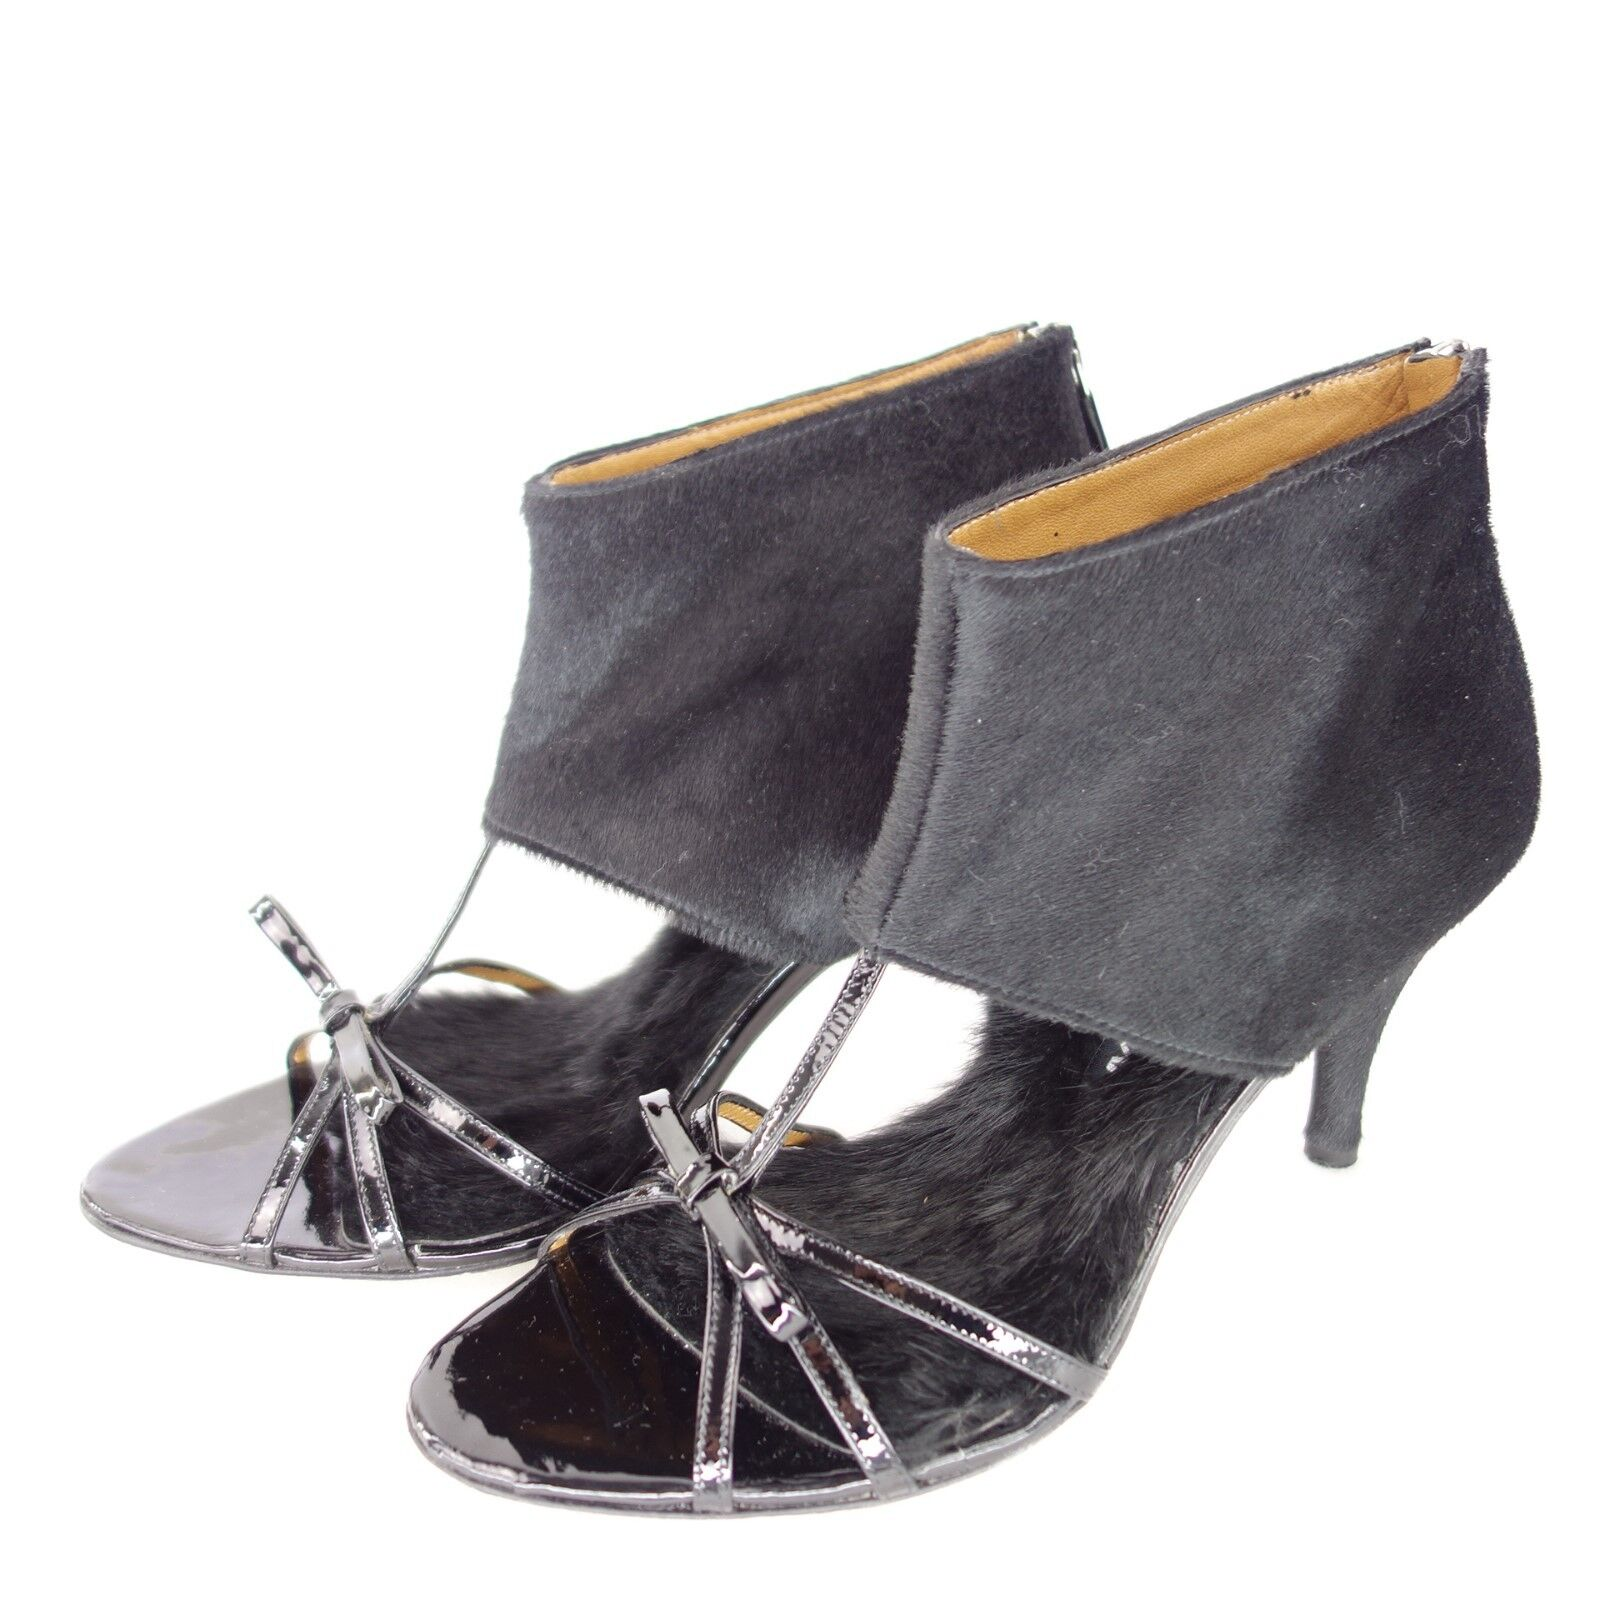 MUXART Damen Sandaletten Schuhe MARTA MARTA MARTA Schwarz Leder Lackleder Fell NP 289 NEU 2052f8